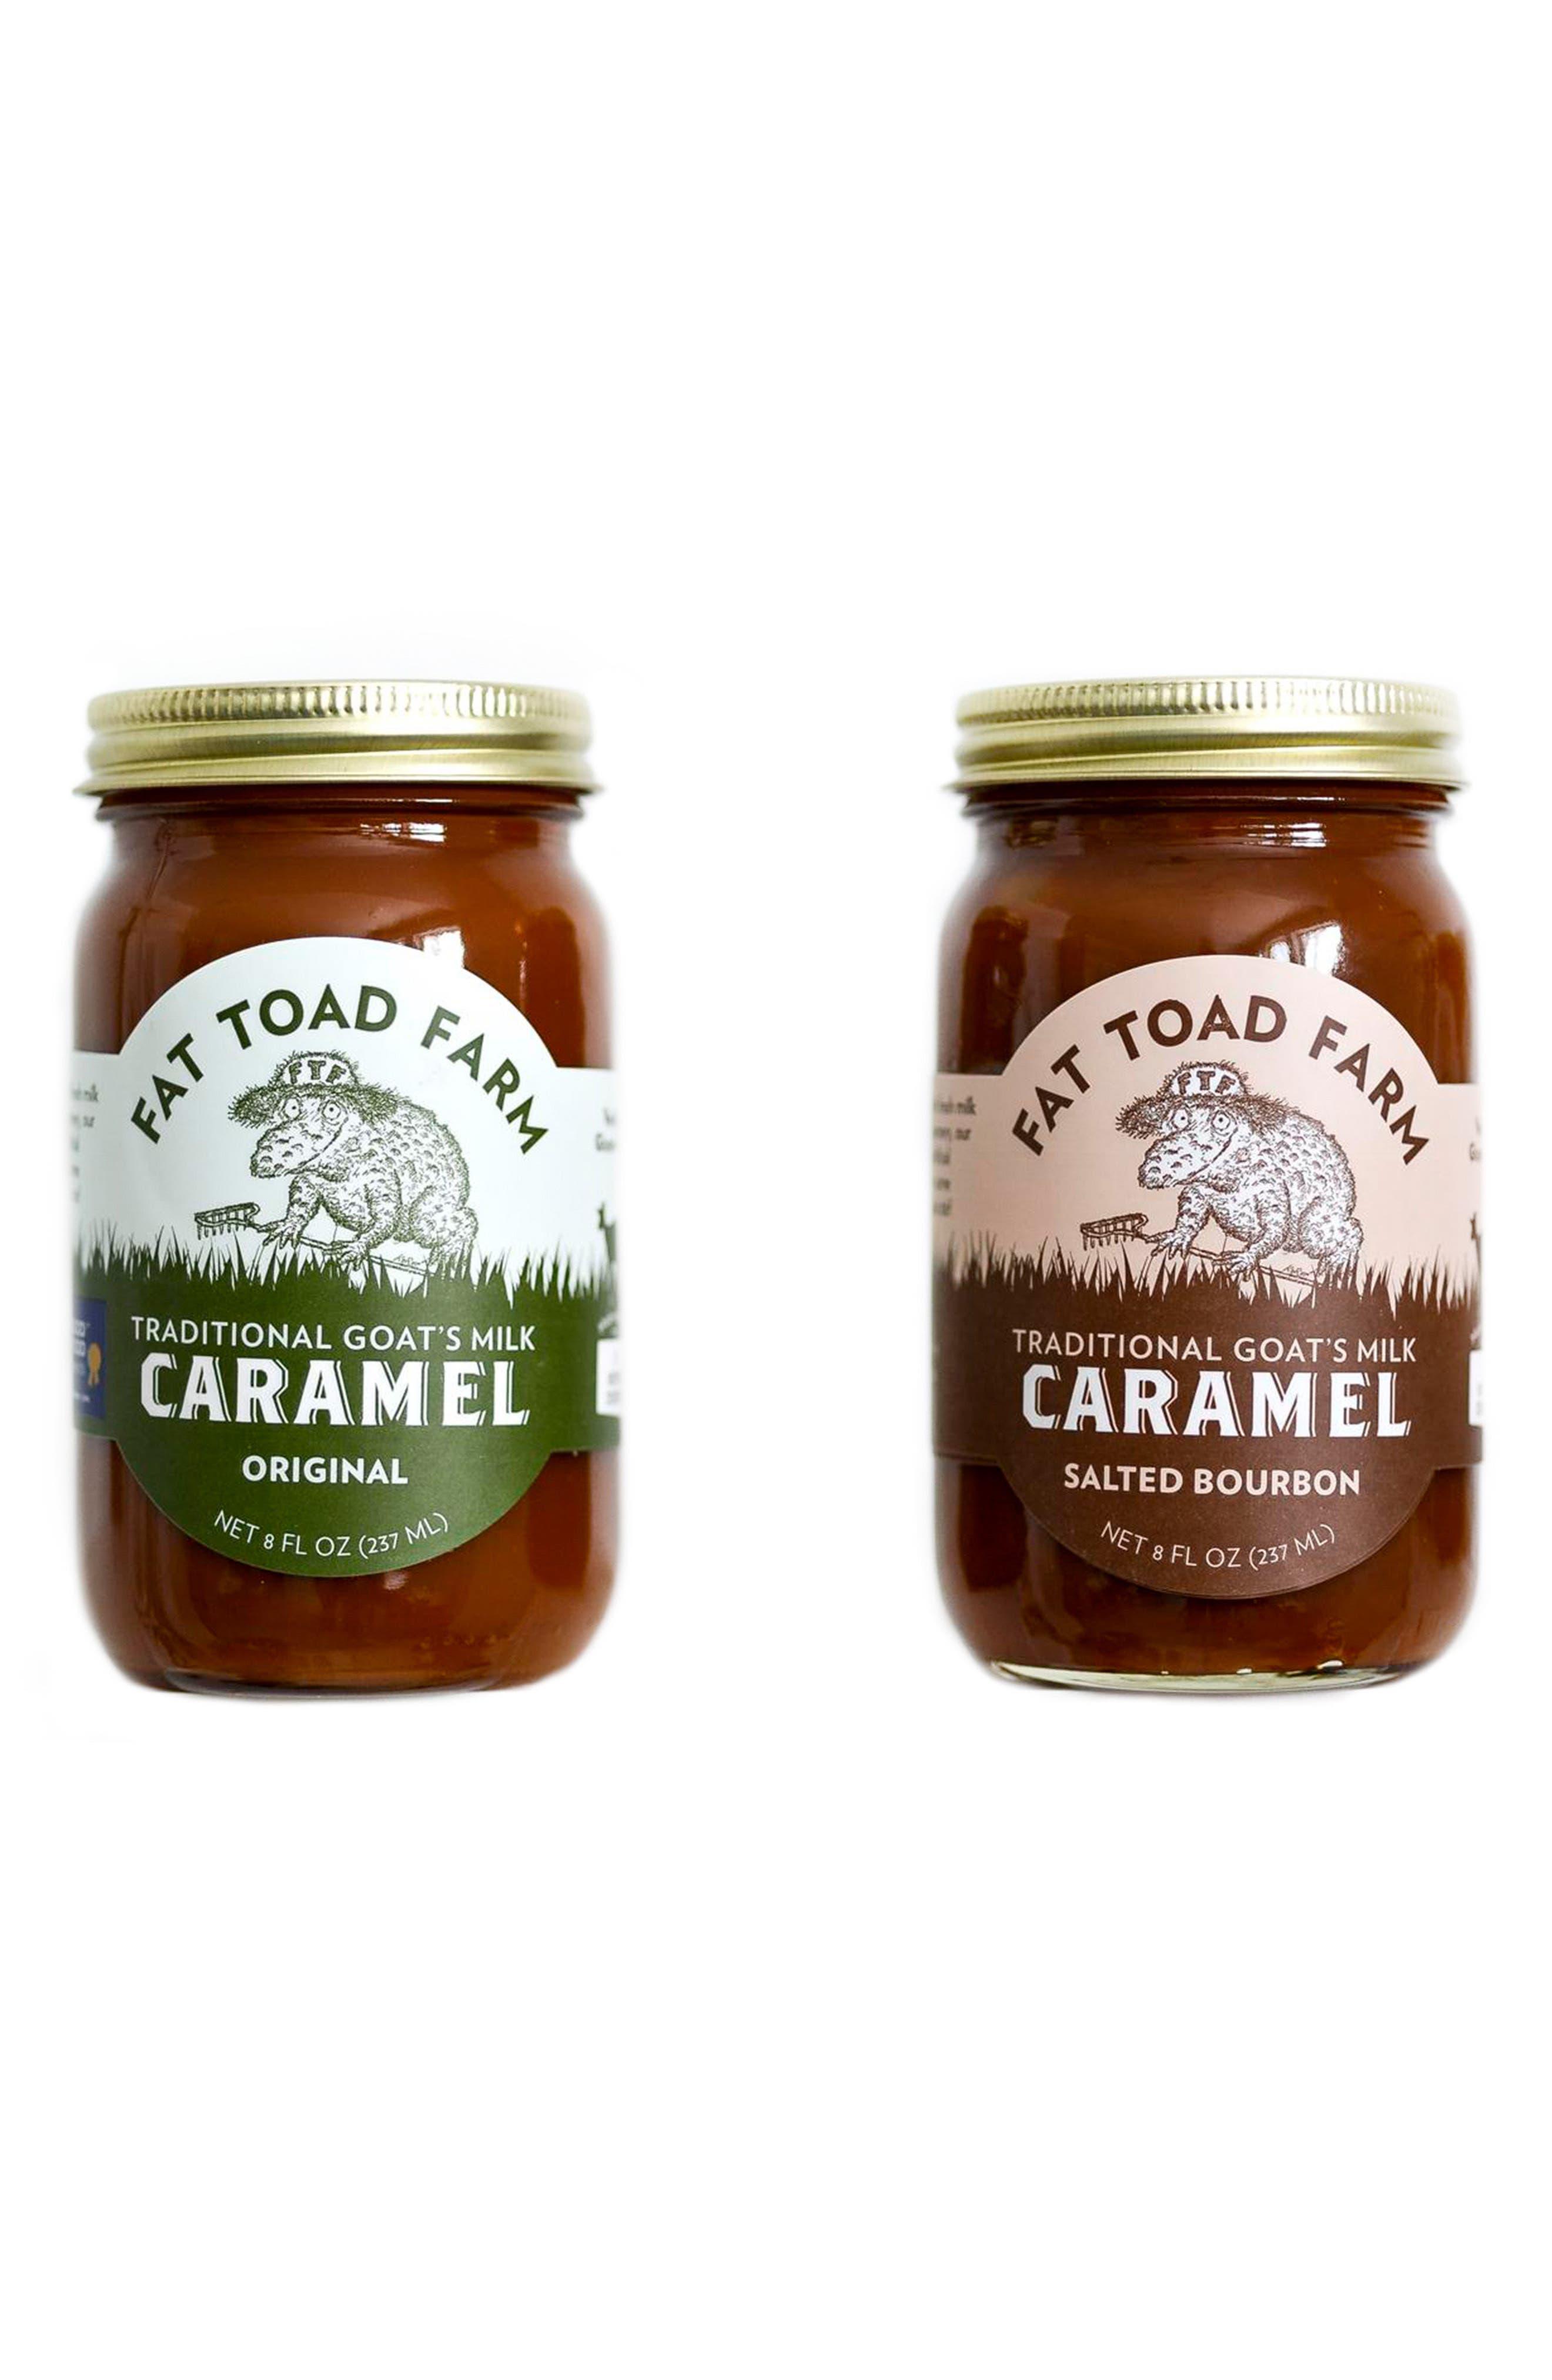 Main Image - Fat Toad Farm Classic Goat's Milk Caramel Duo